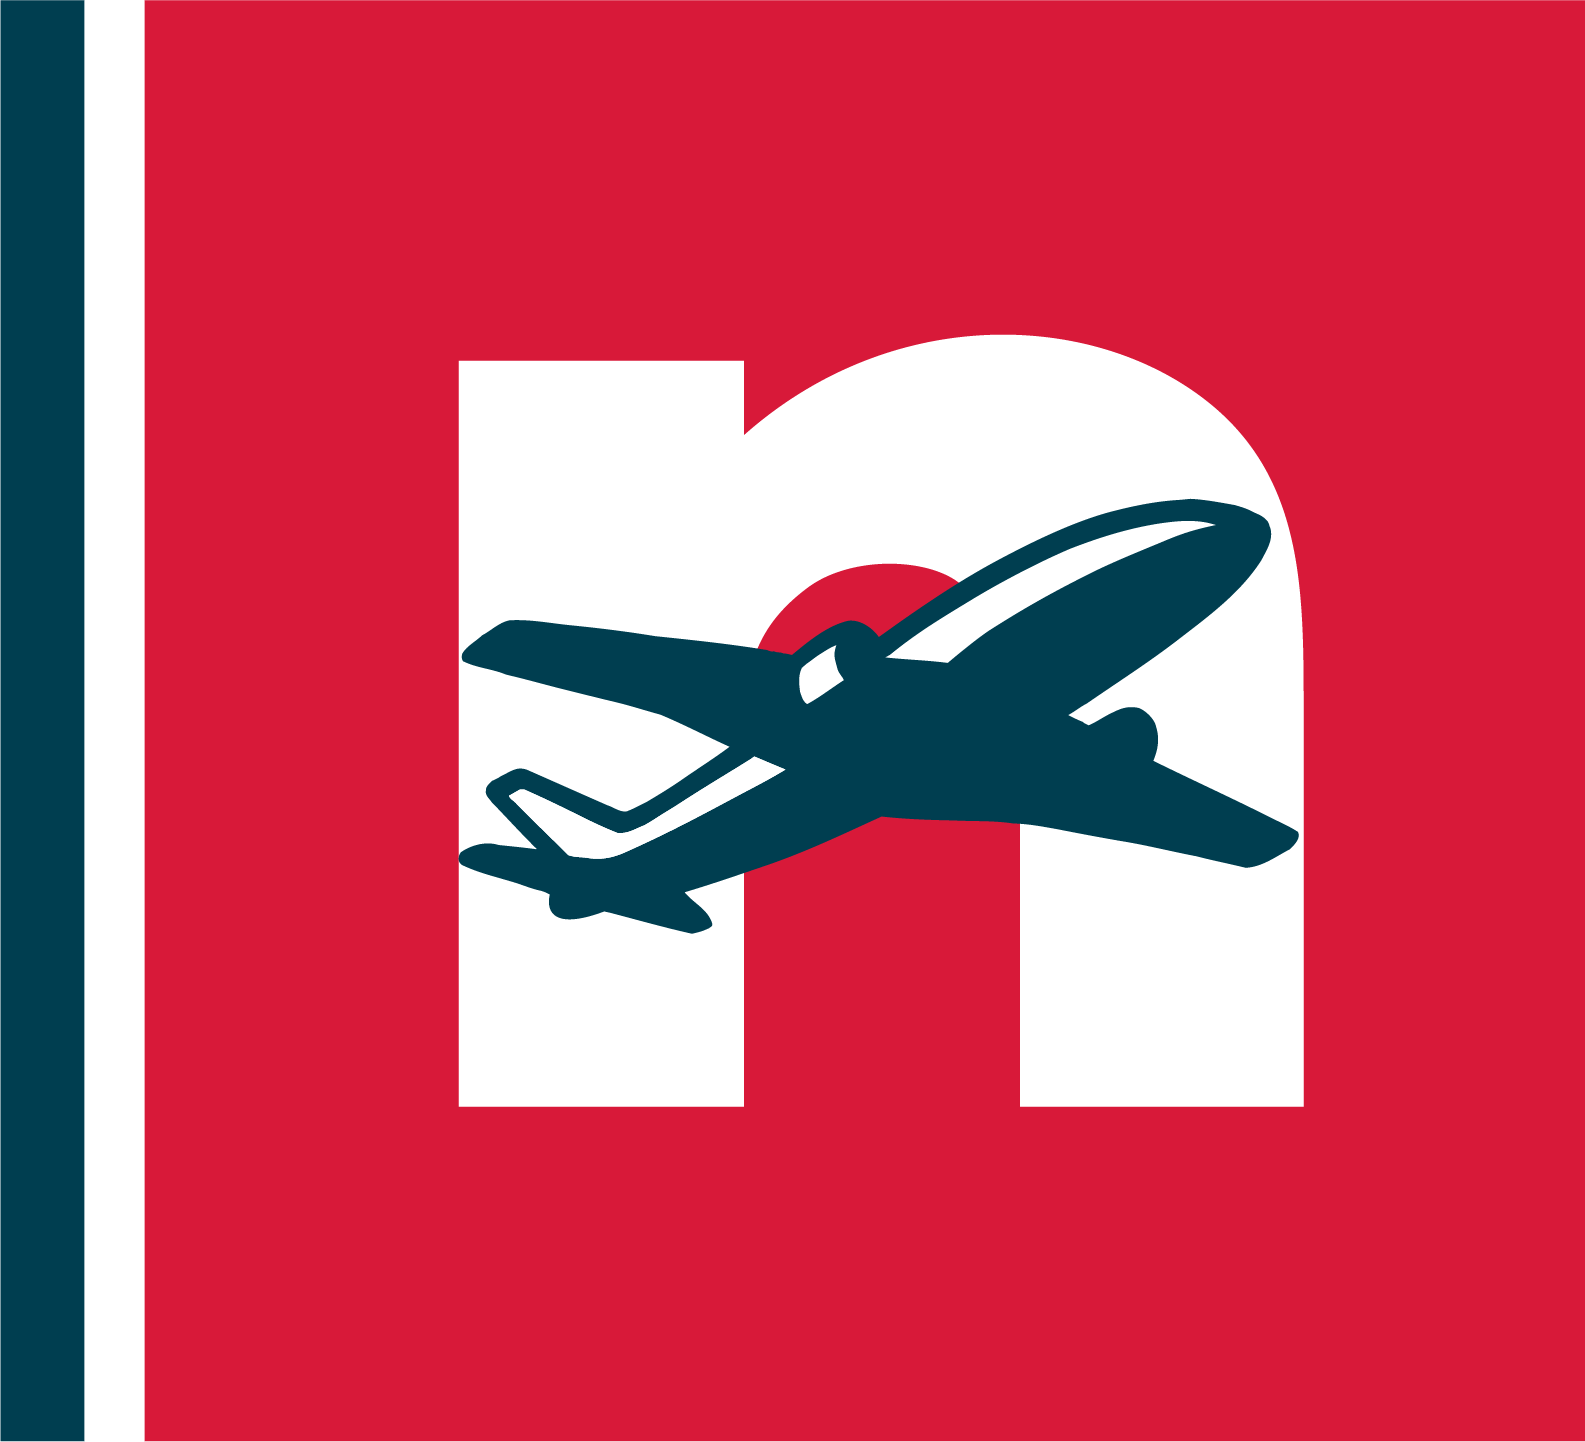 Norwegian Long Haul AS